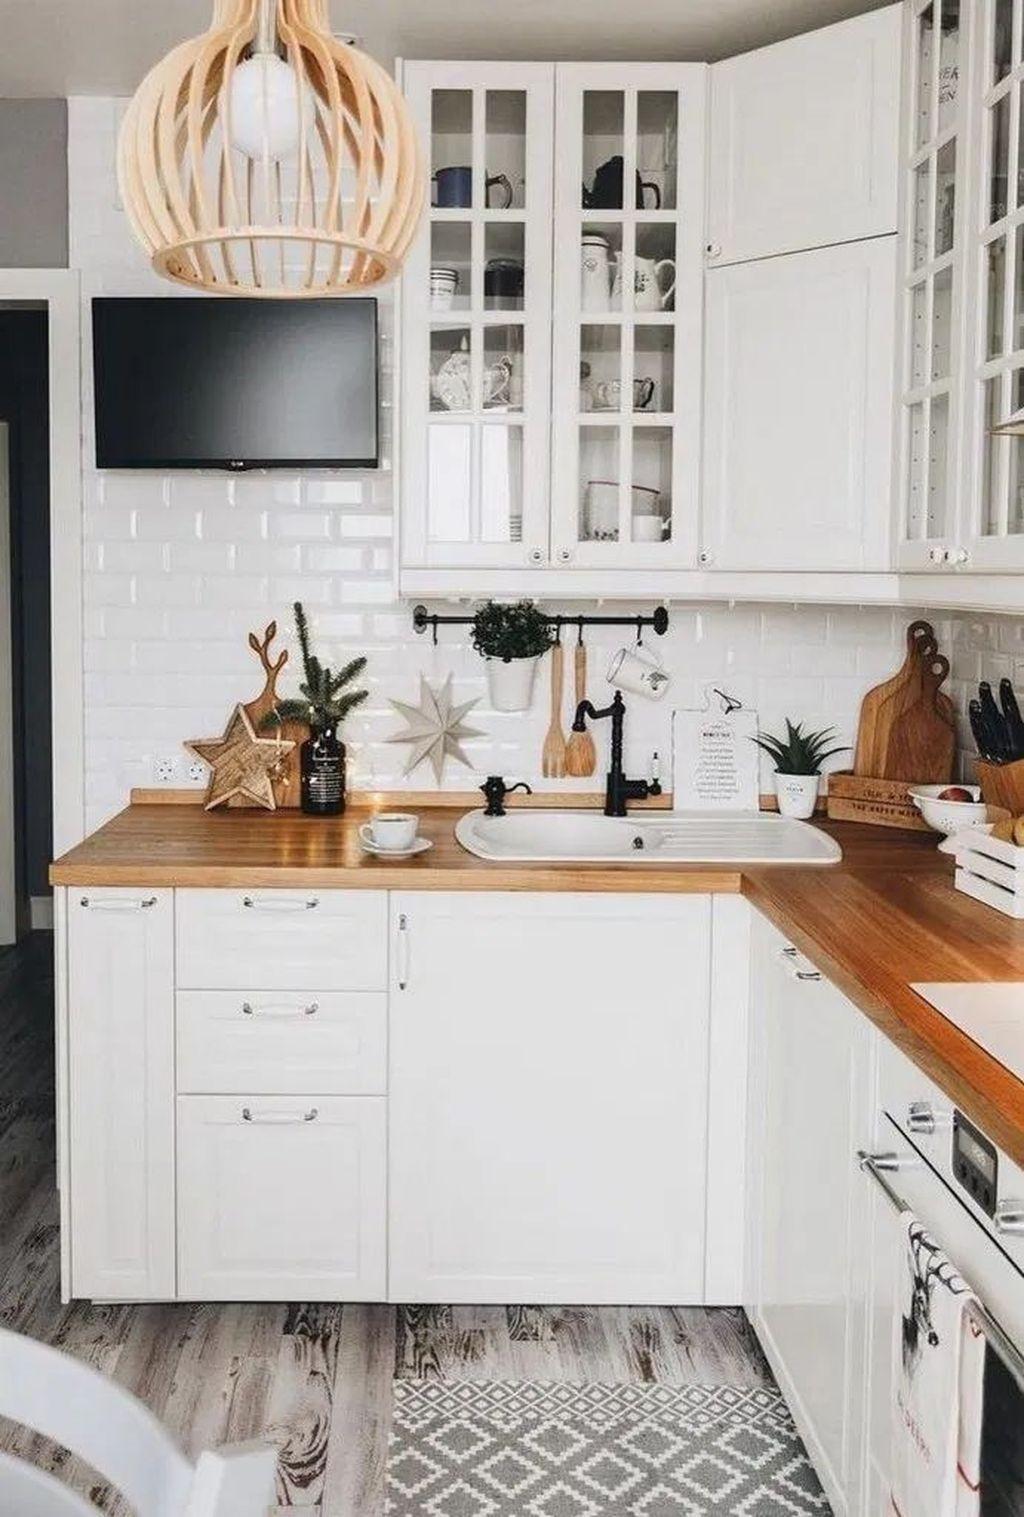 32 Popular Apartment Kitchen Design Ideas You Should Copy Pimphomee Kitchen Design Small Galley Kitchen Design Interior Design Kitchen